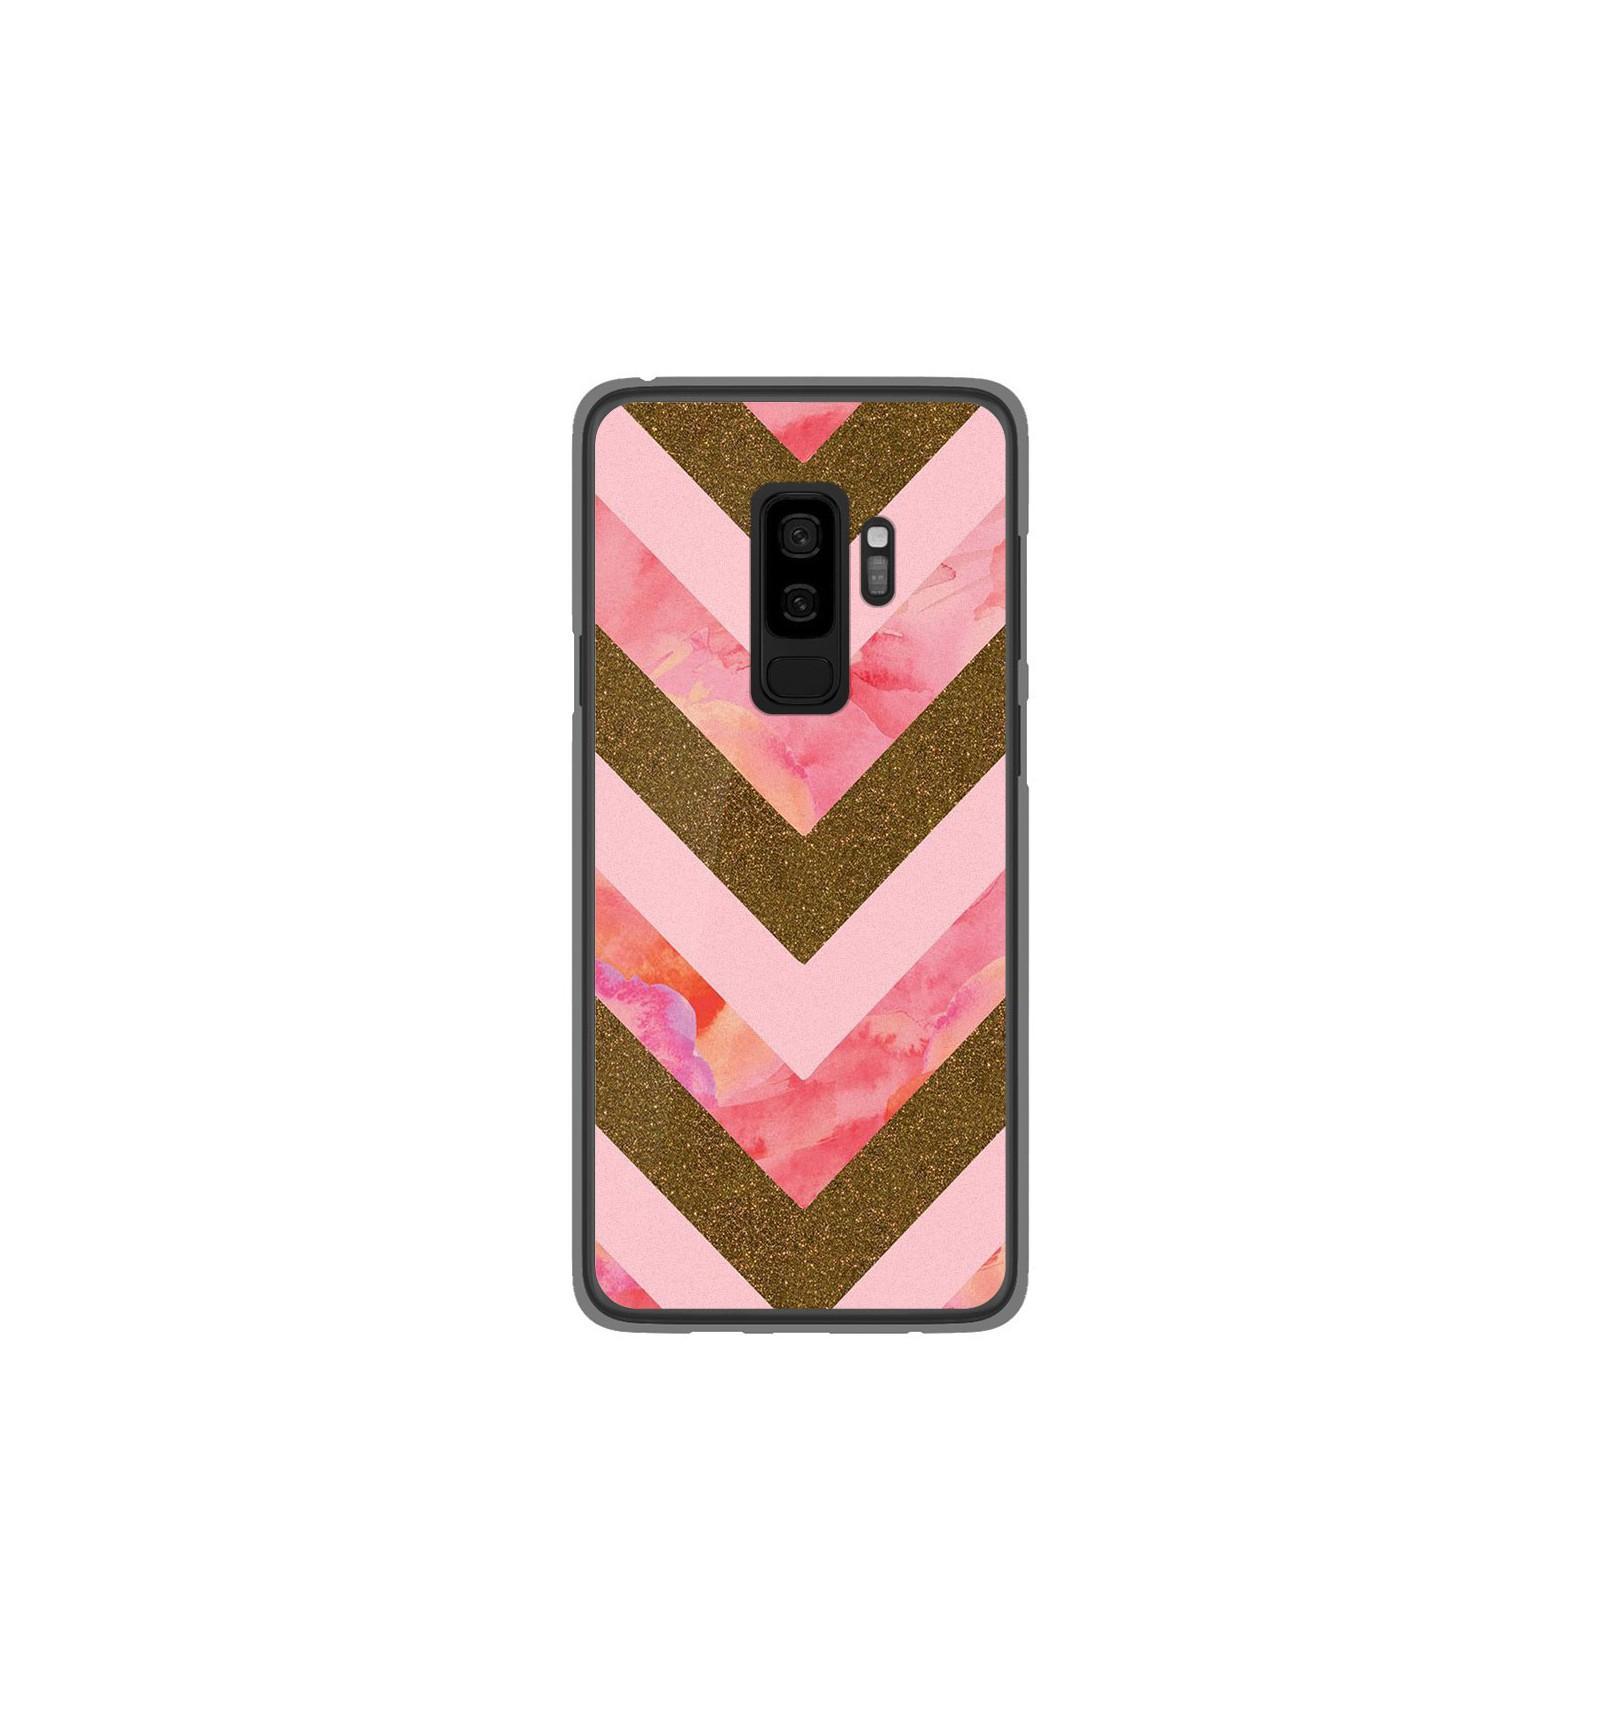 Coque en silicone Samsung Galaxy S9 Plus - Texture paillettes